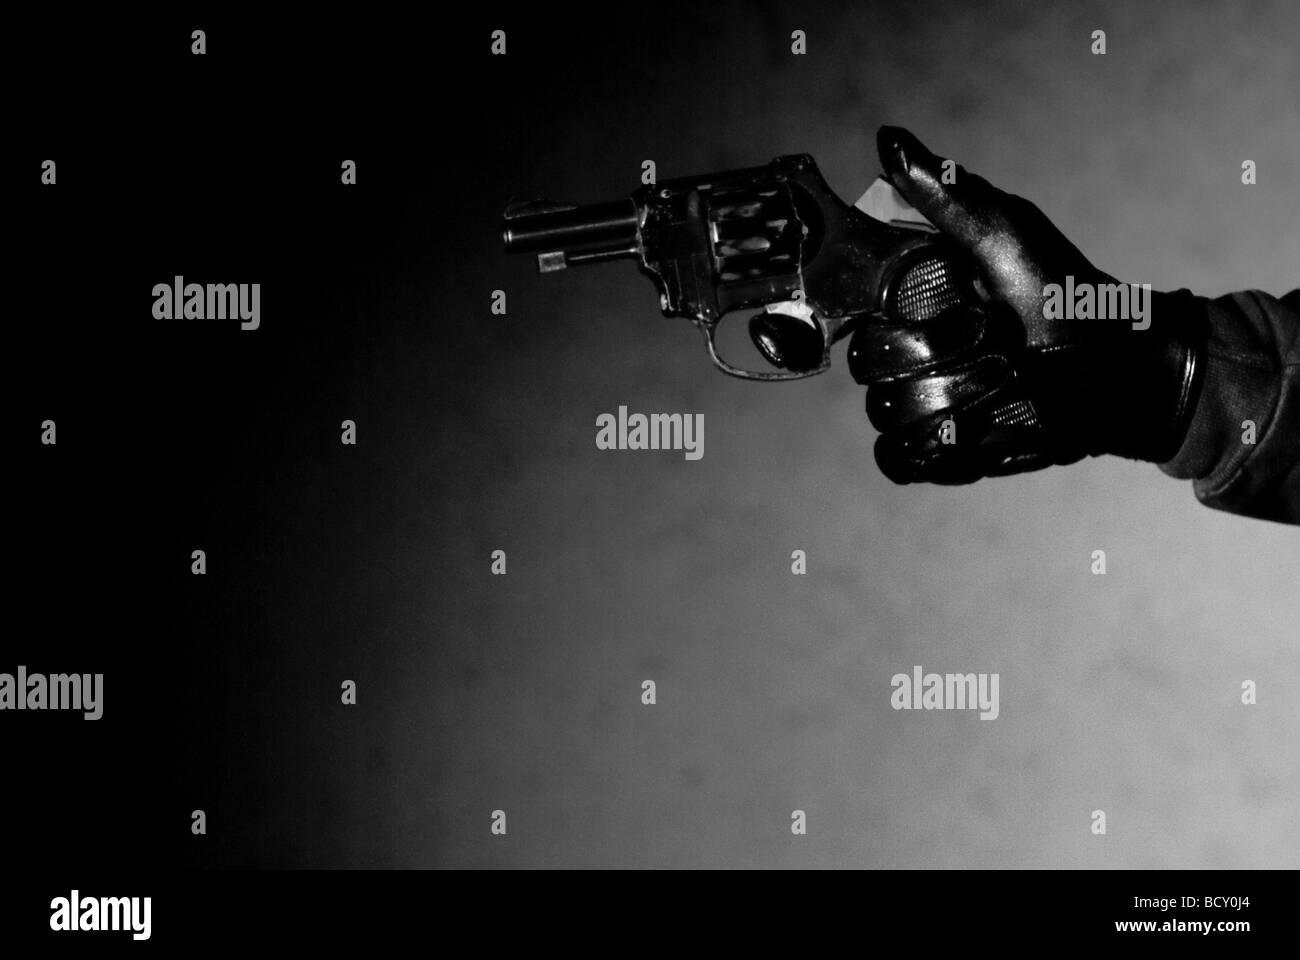 Assailant holding a gun - Stock Image